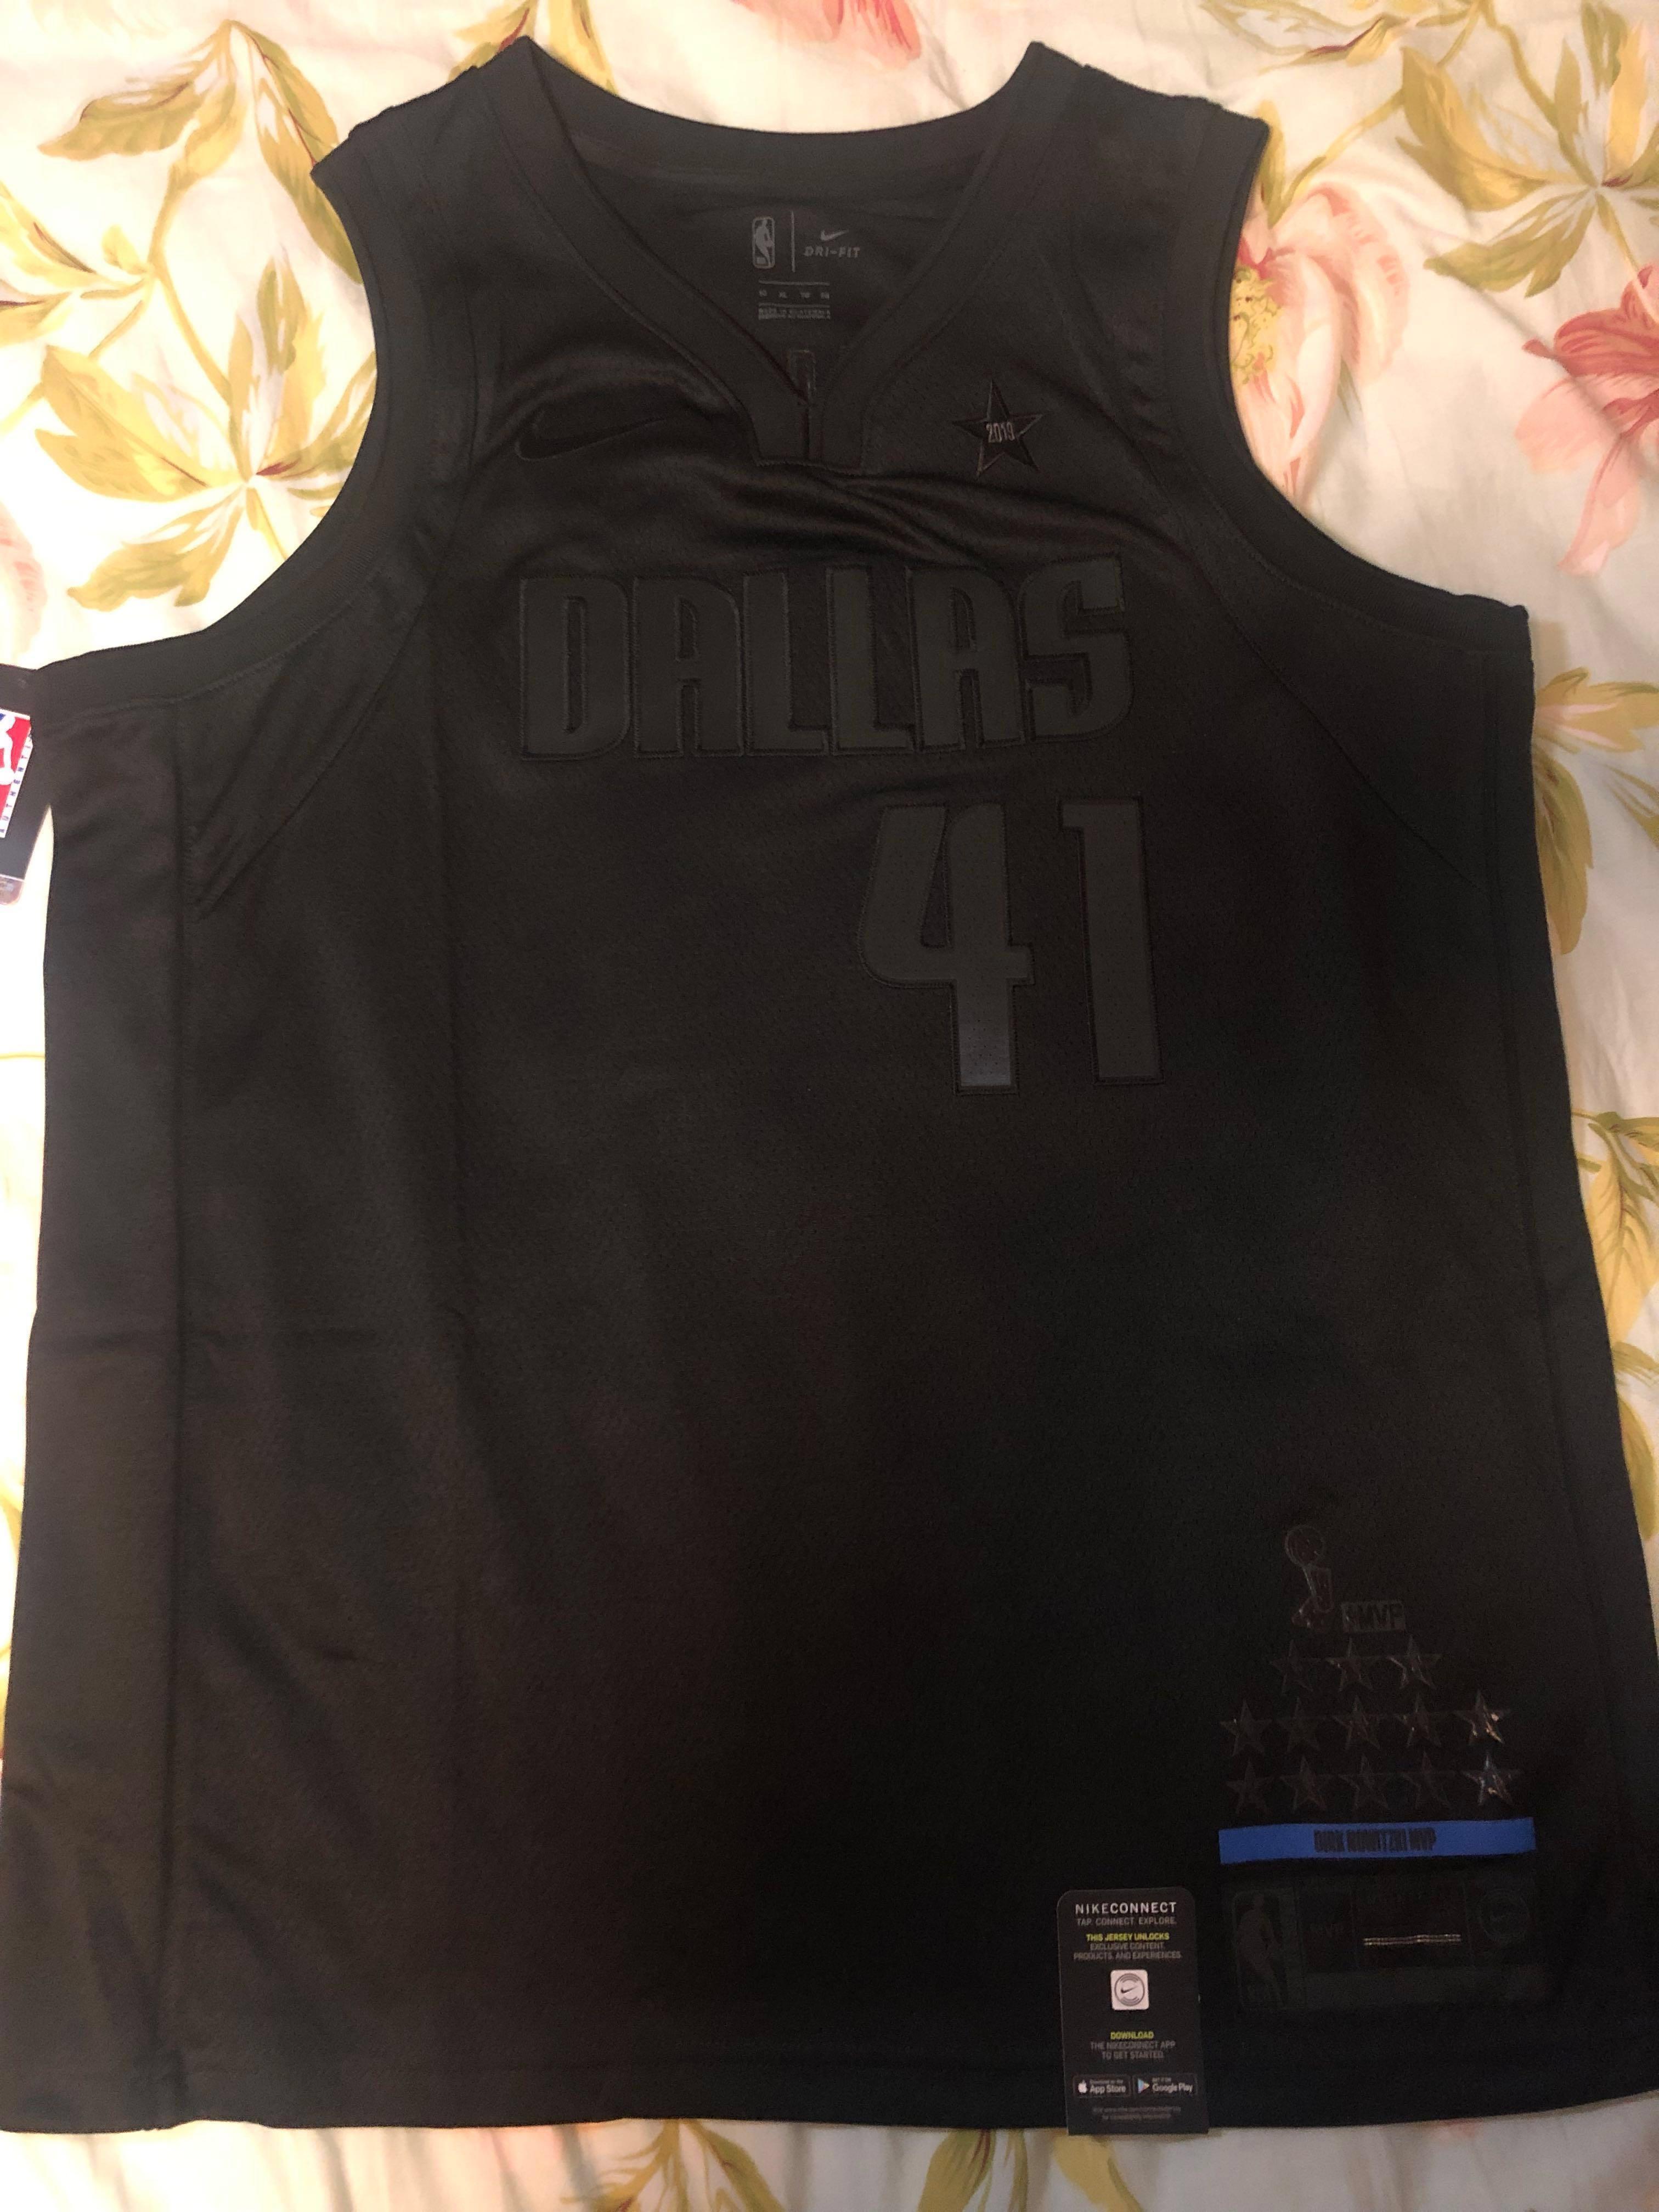 official photos 164c1 1b5d4 Nike Dirk Nowitzki MVP Jersey Dallas Mavericks Black Jersey